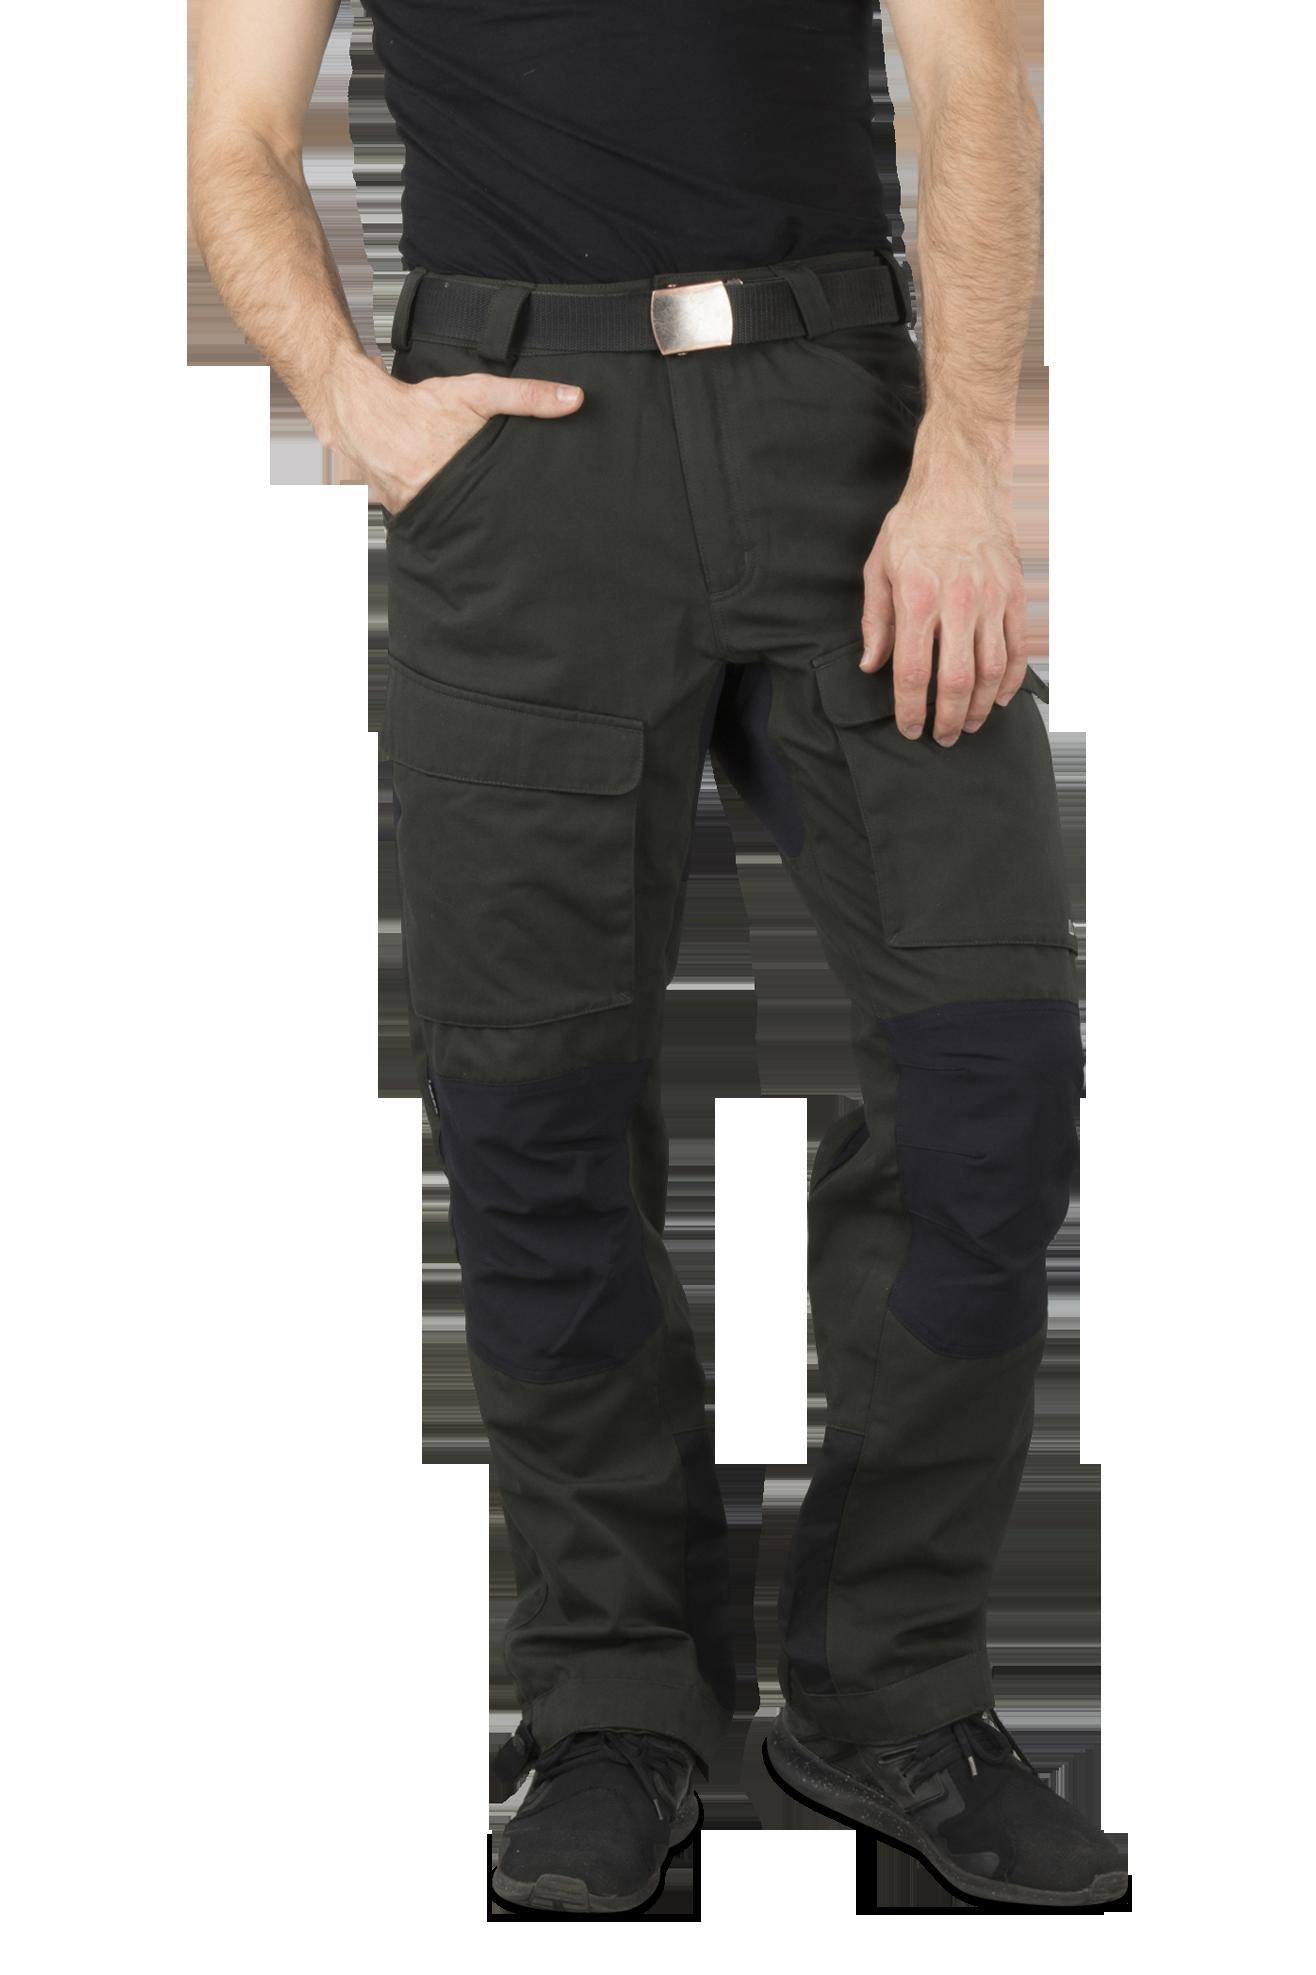 TOBE Outerwear Friluftsbukse TOBE Origo Dark Ink